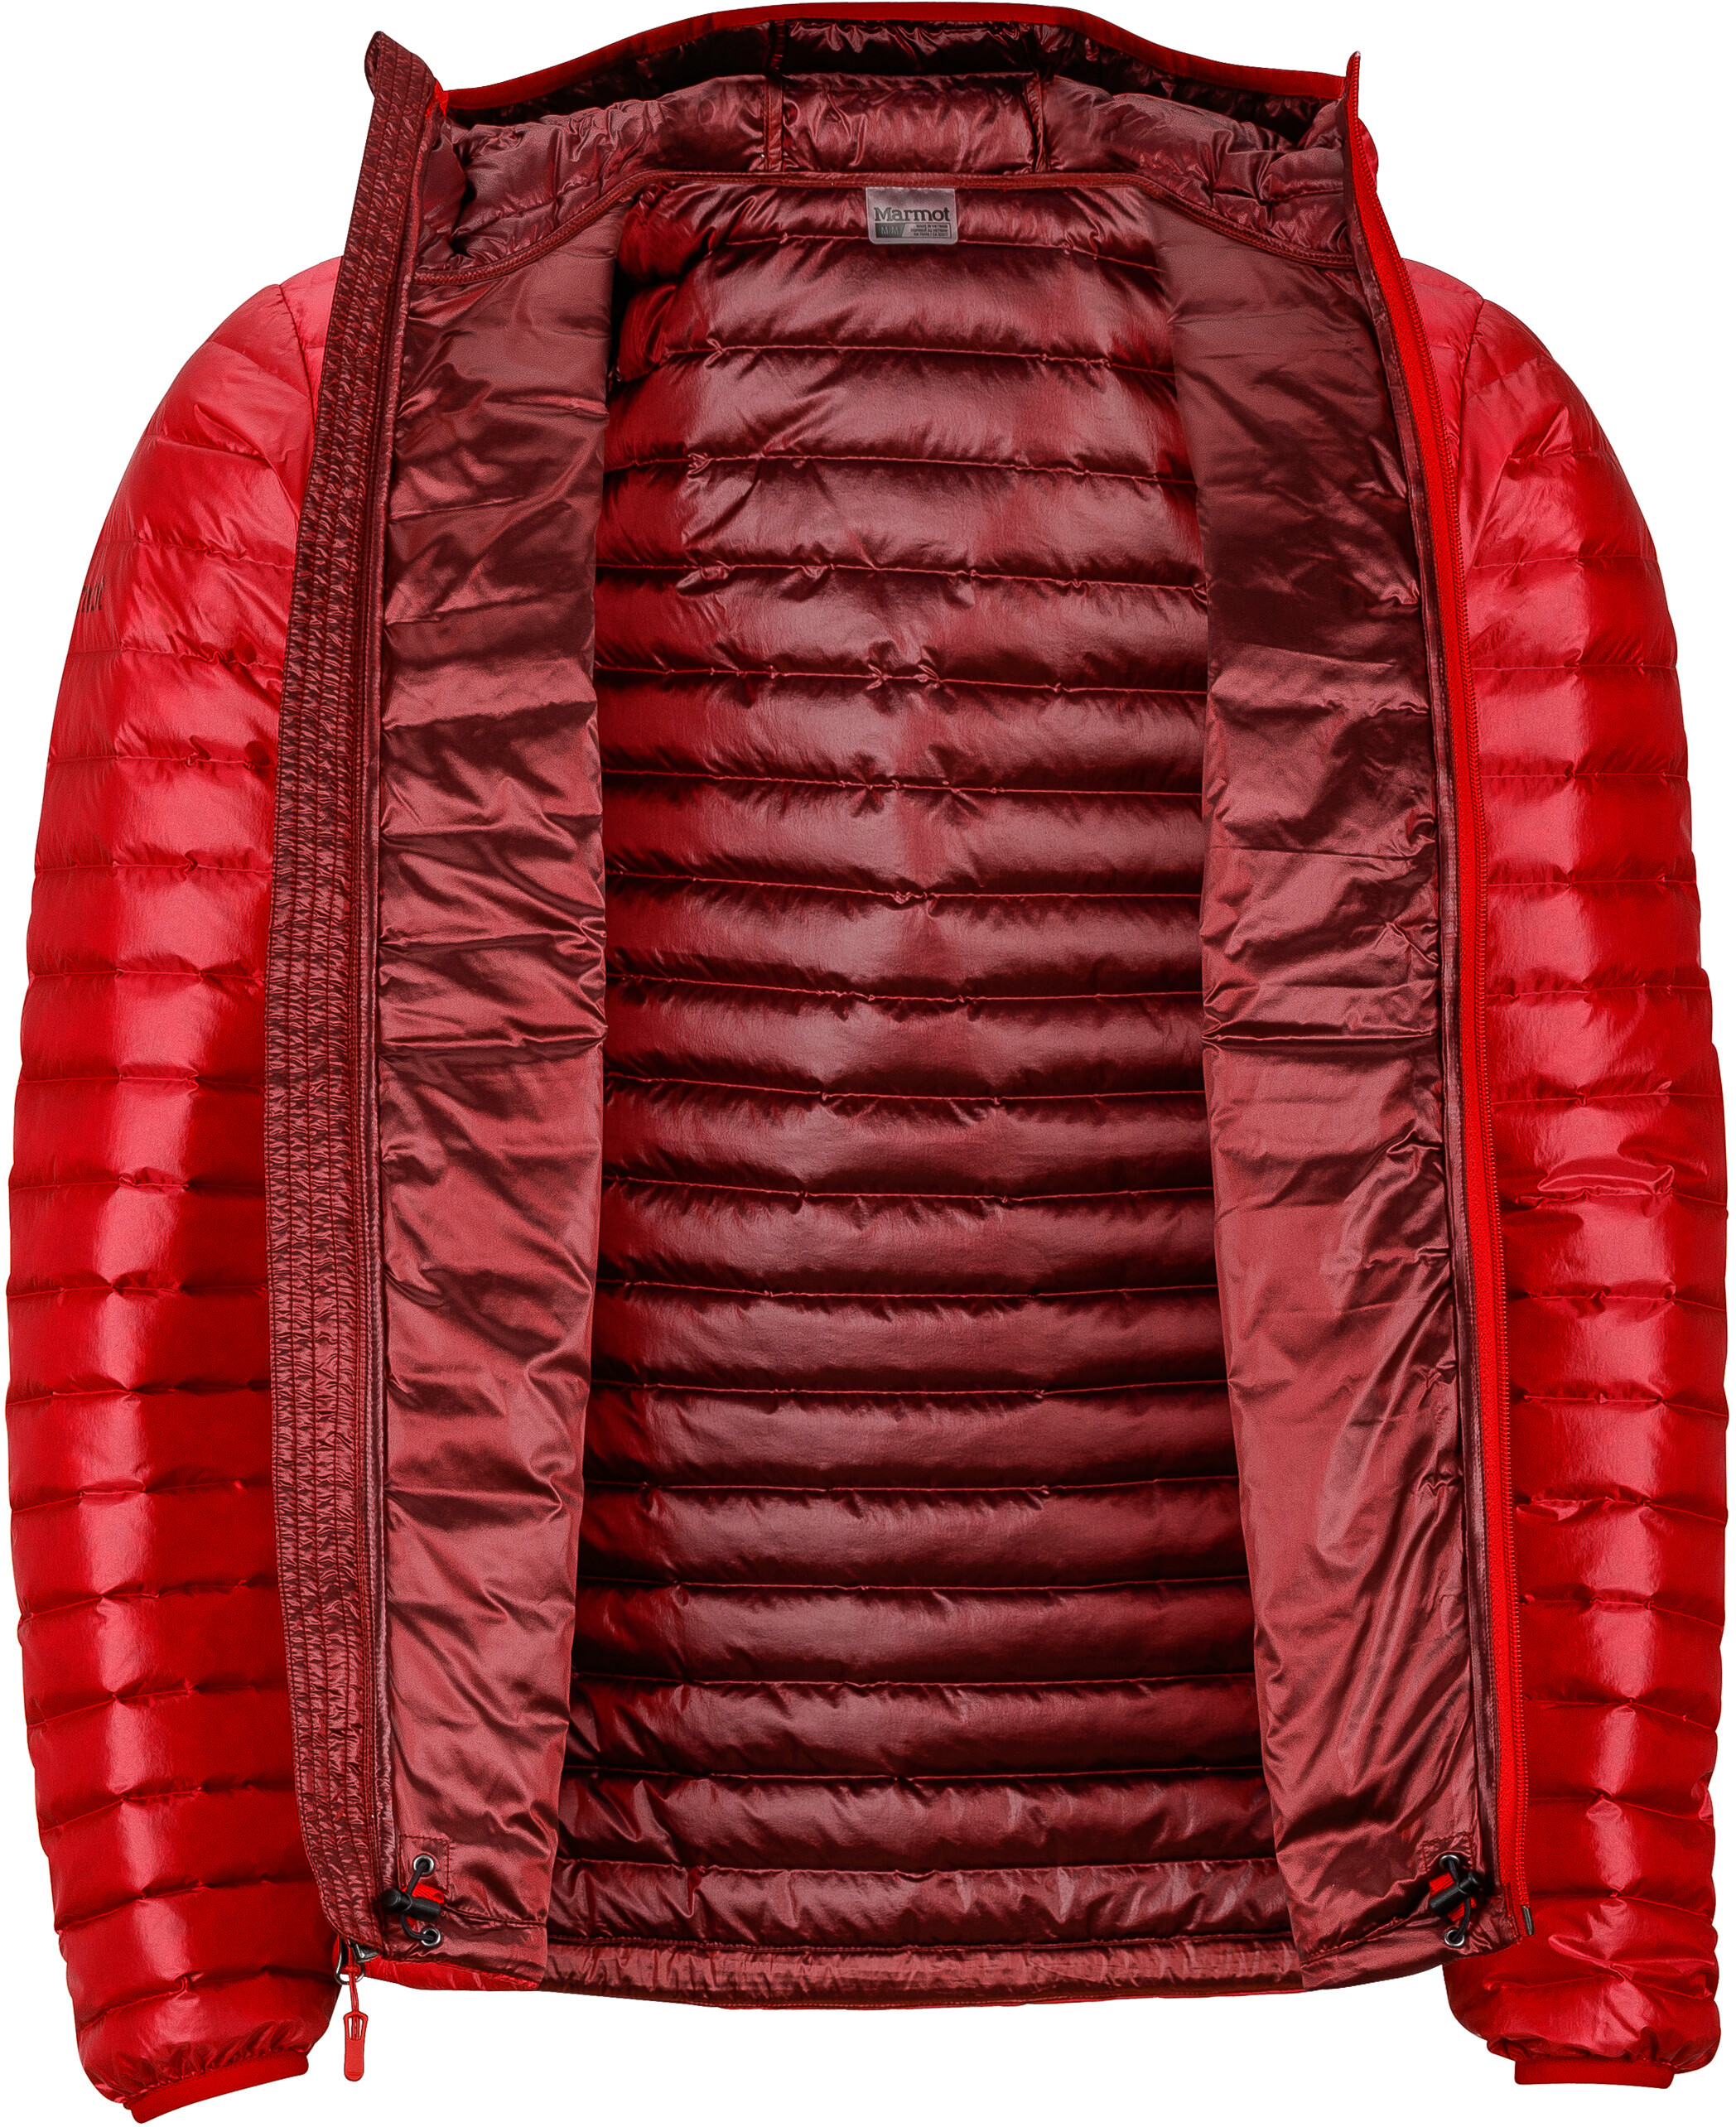 new arrival 6f497 e985e Marmot Quasar Nova Miehet takki , punainen